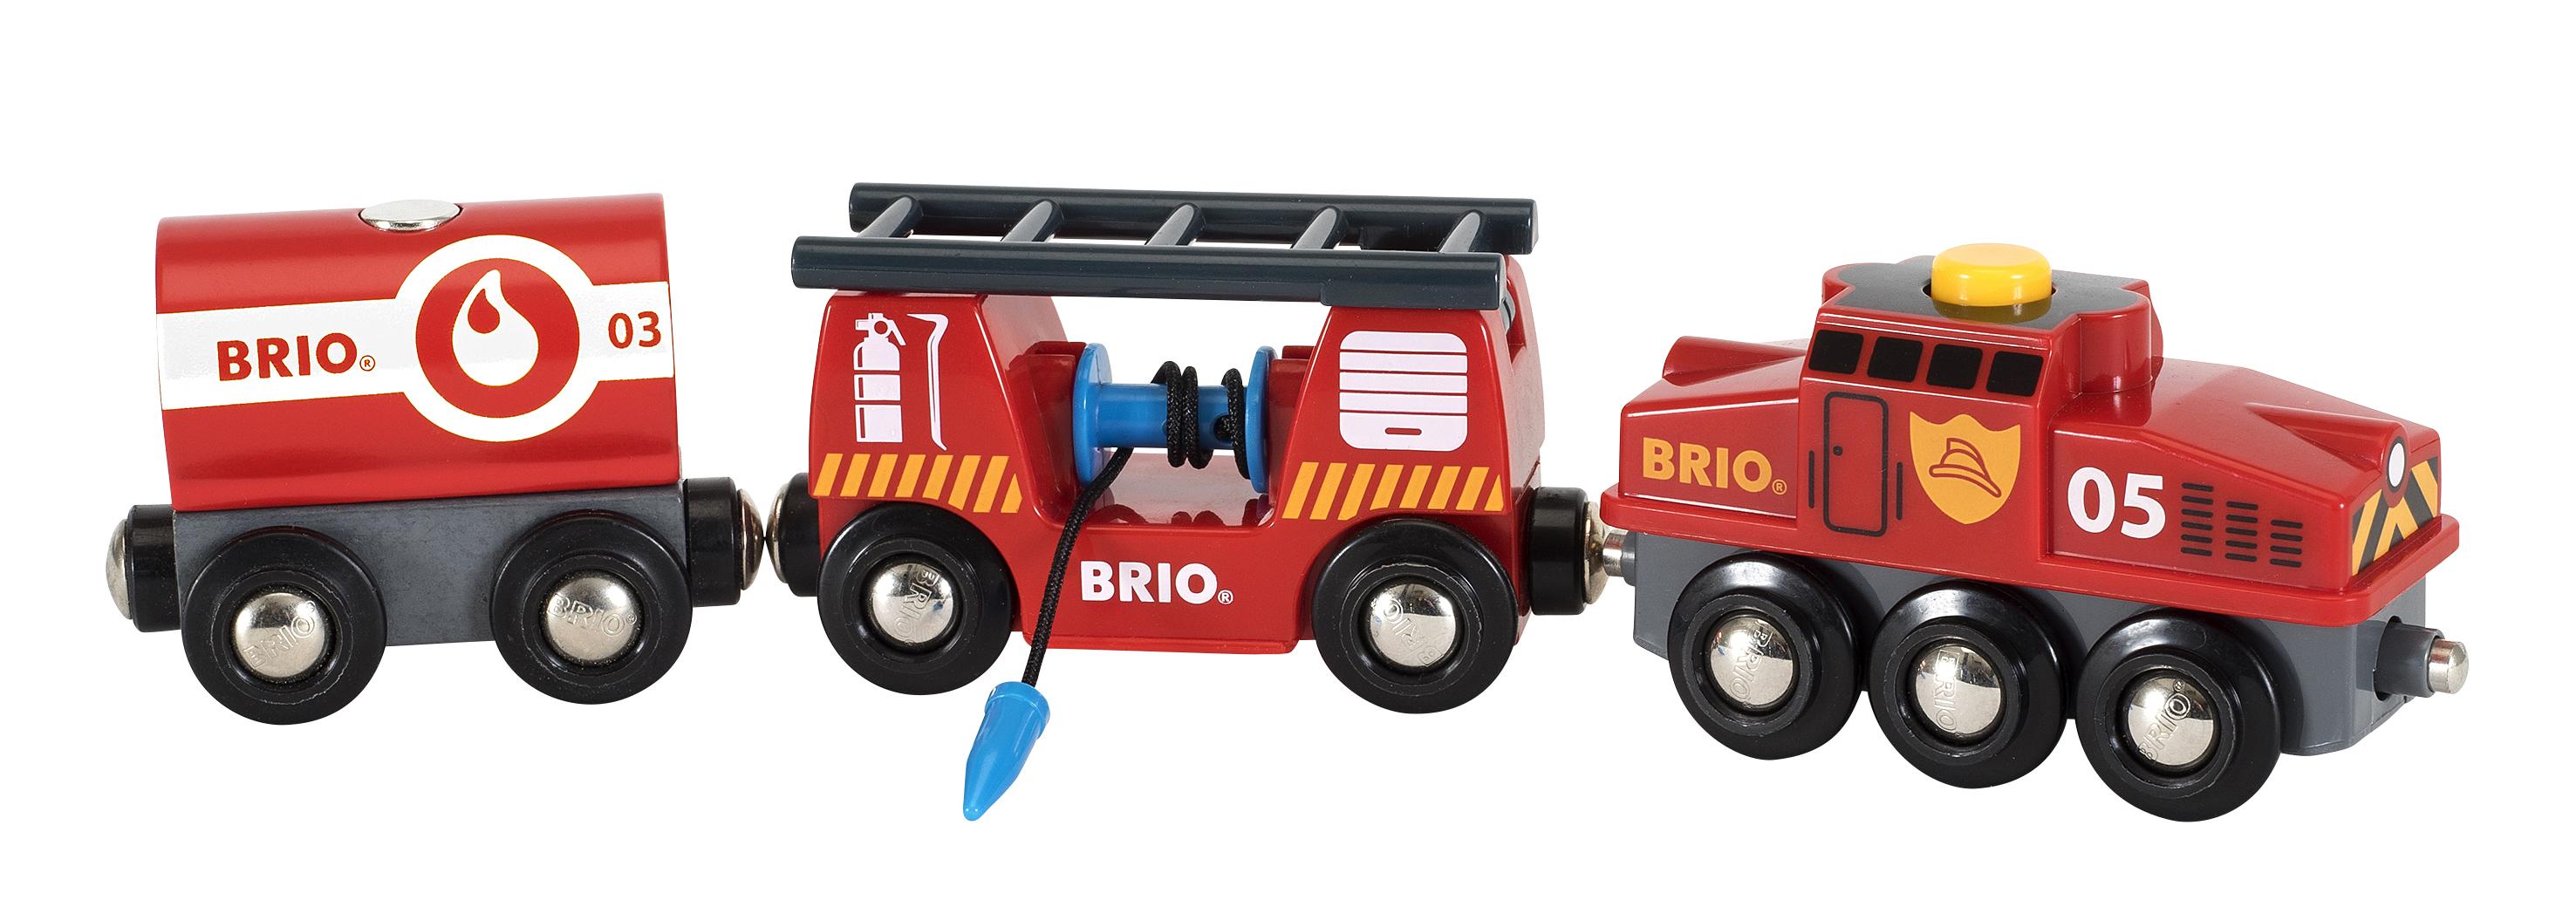 BRIO redningstog